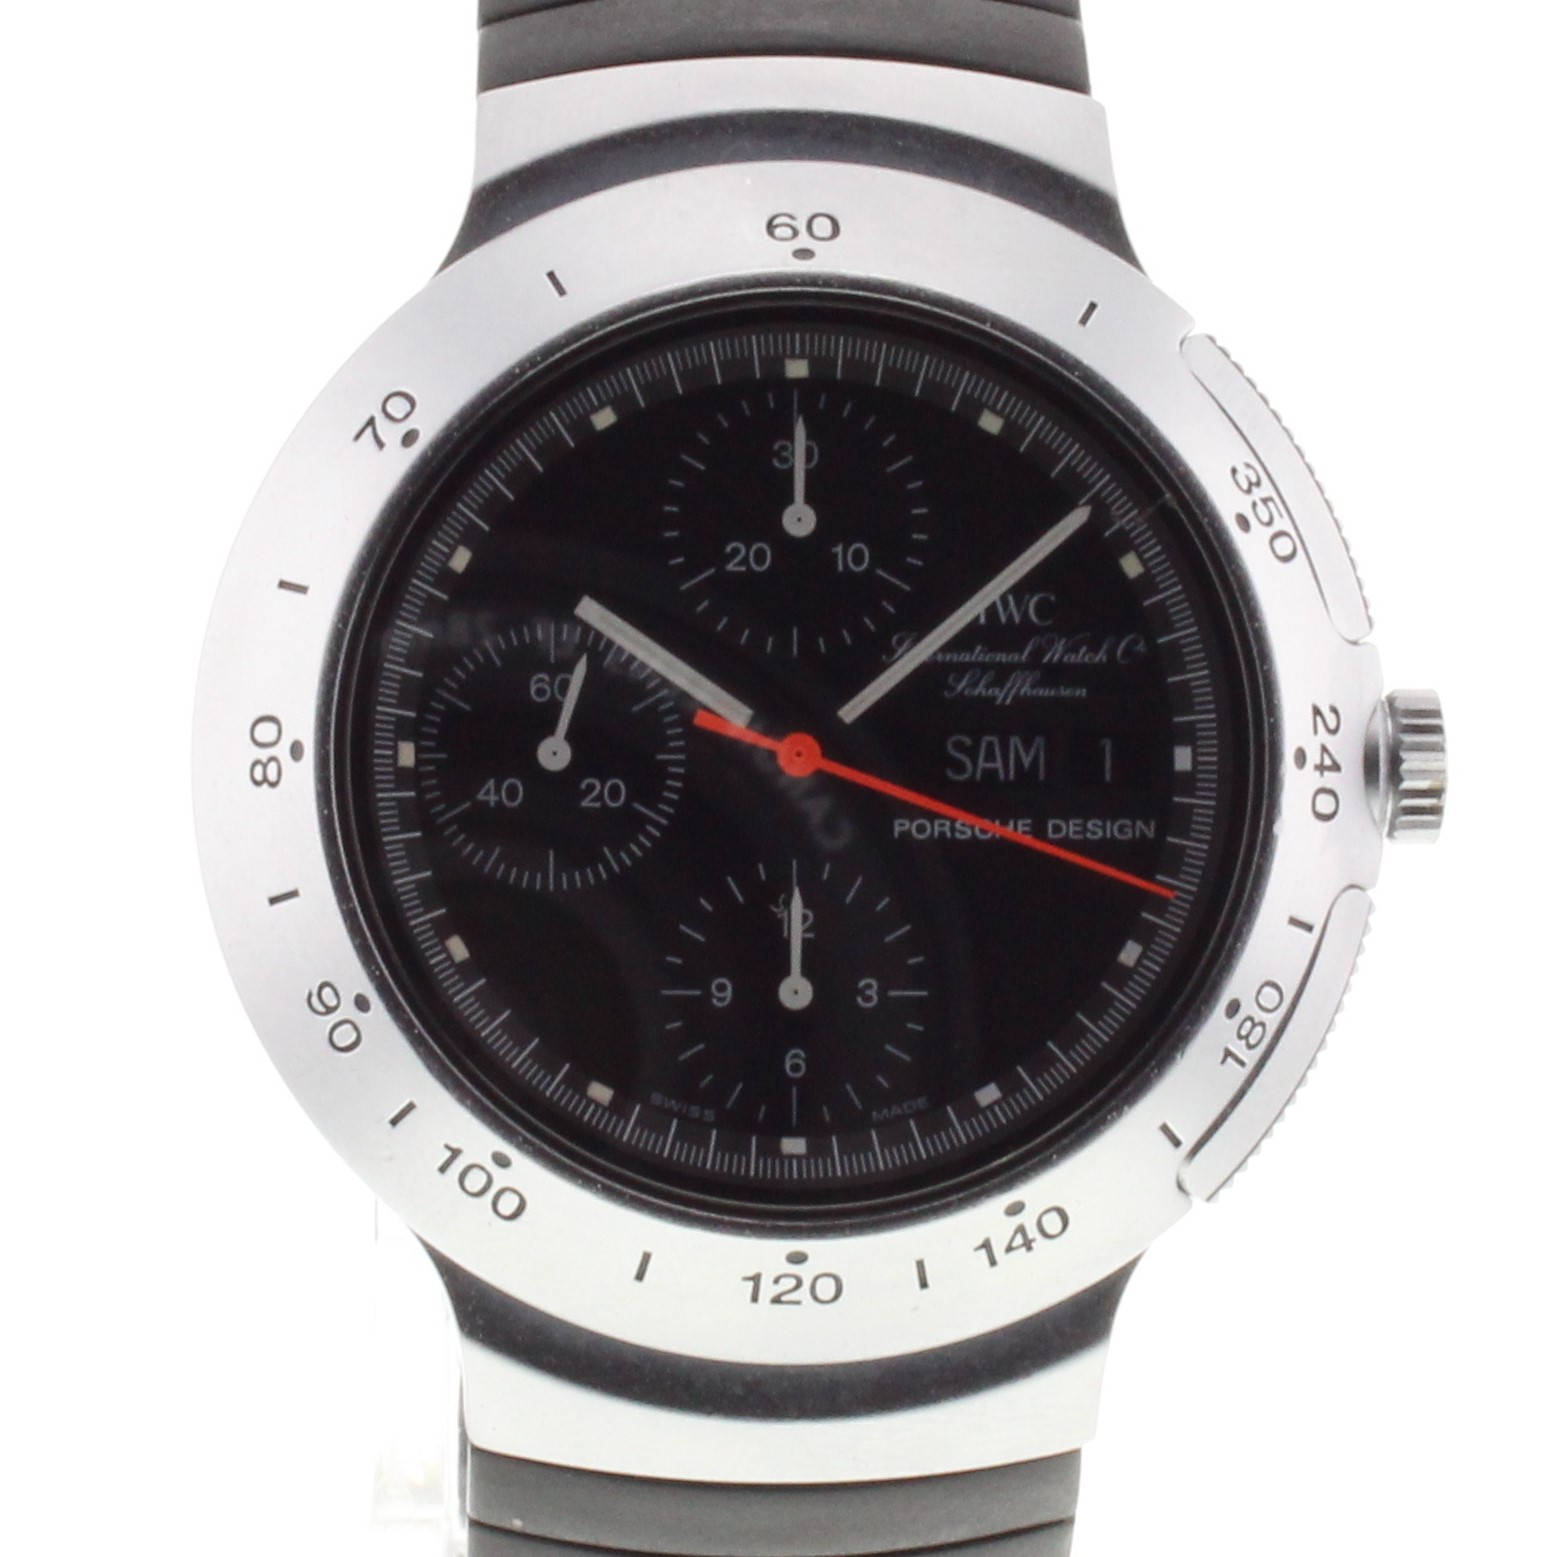 Iwc Porsche Design 3701 For Sale Chronext